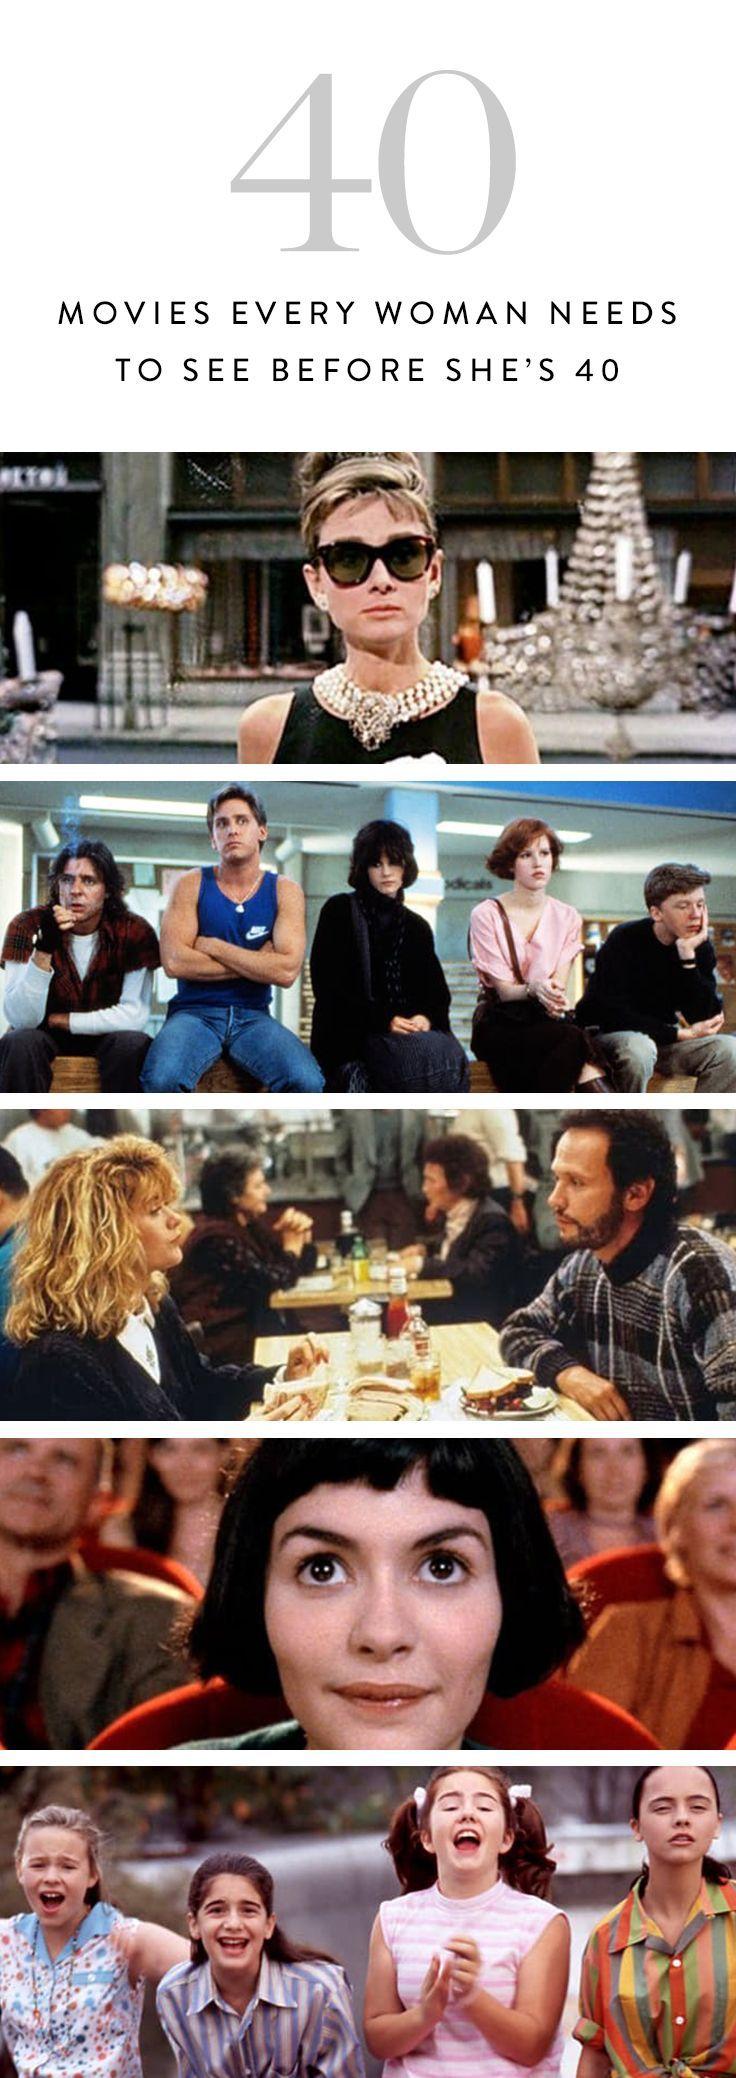 40 Movies Every Woman Should See Before She's 40 via @PureWow via @PureWow: